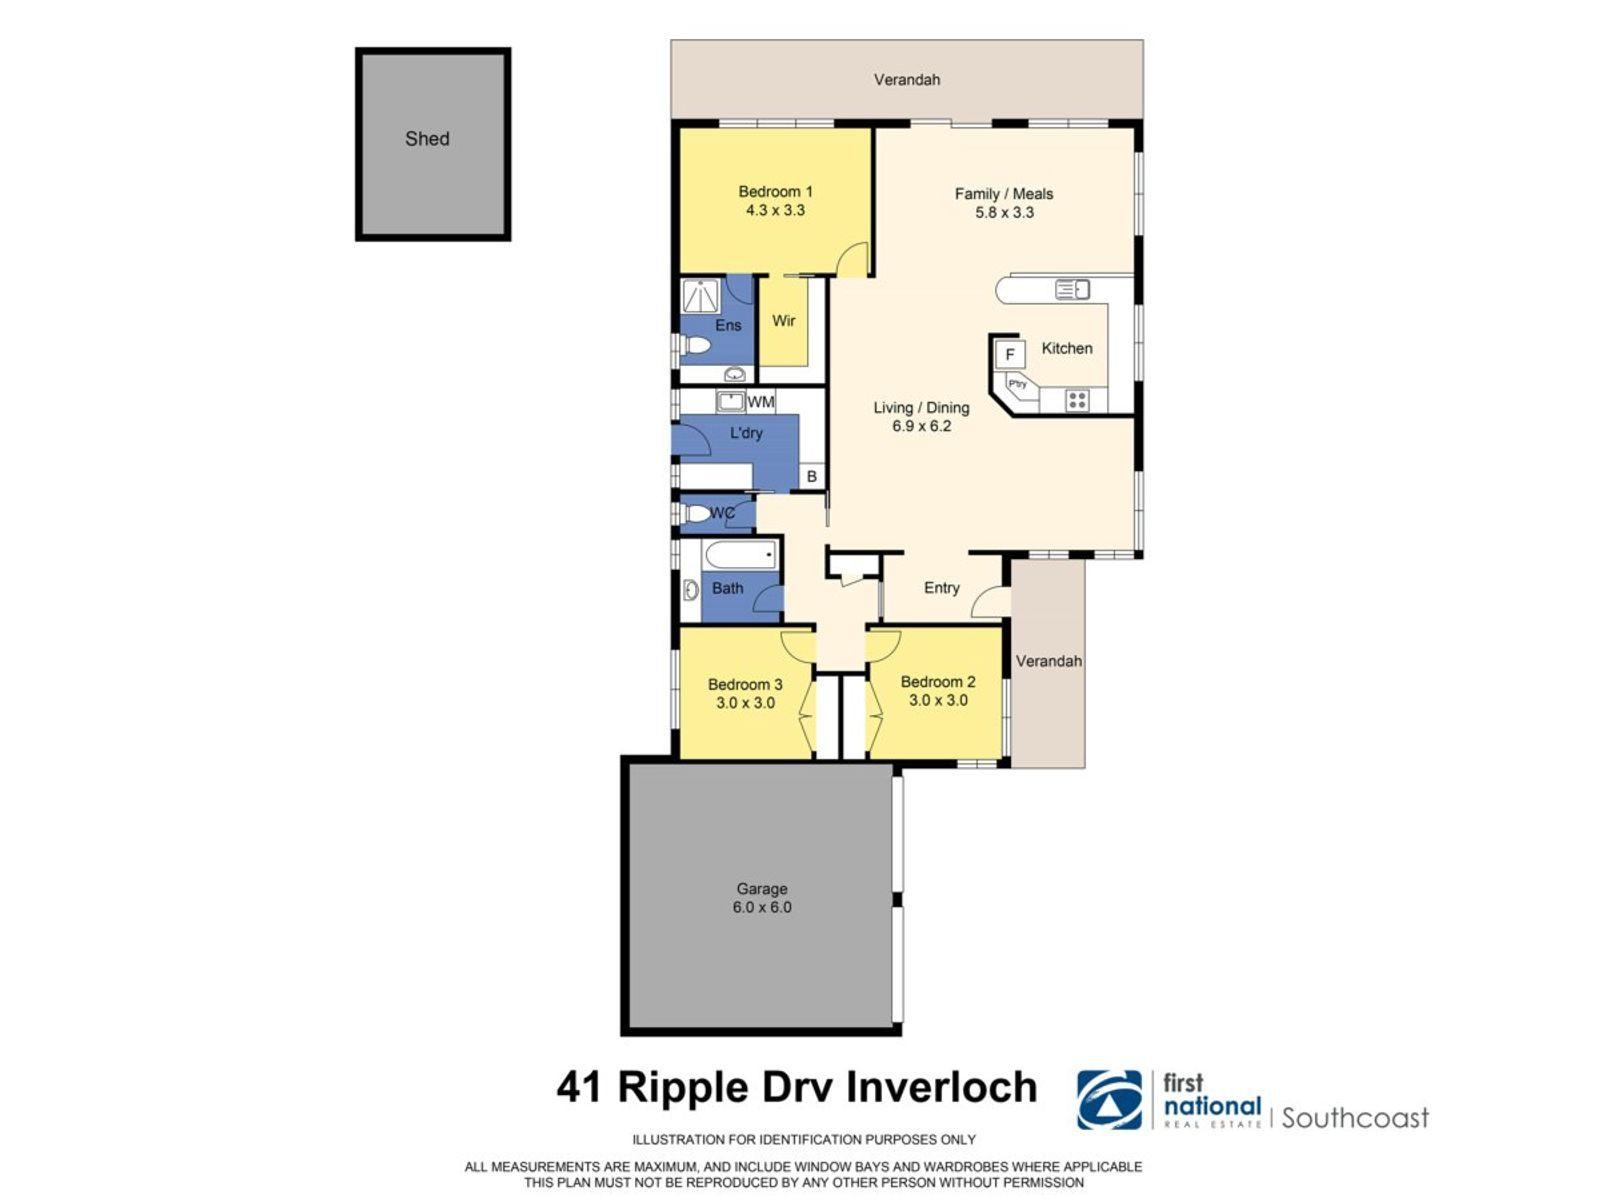 41 Ripple Drive, Inverloch, VIC 3996